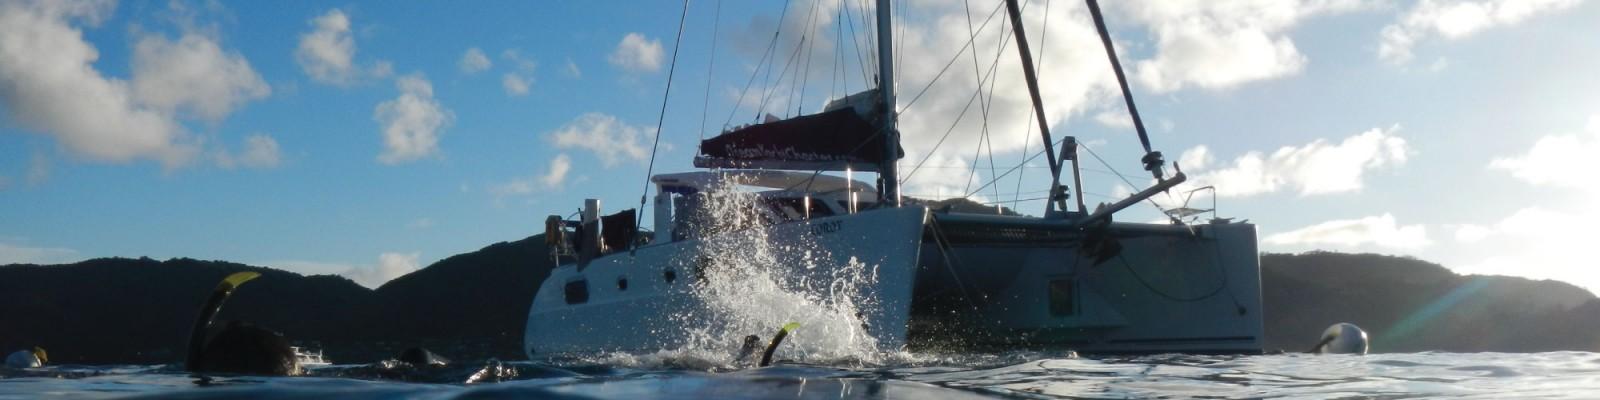 Tenrag Yacht Charter: The Seychelles